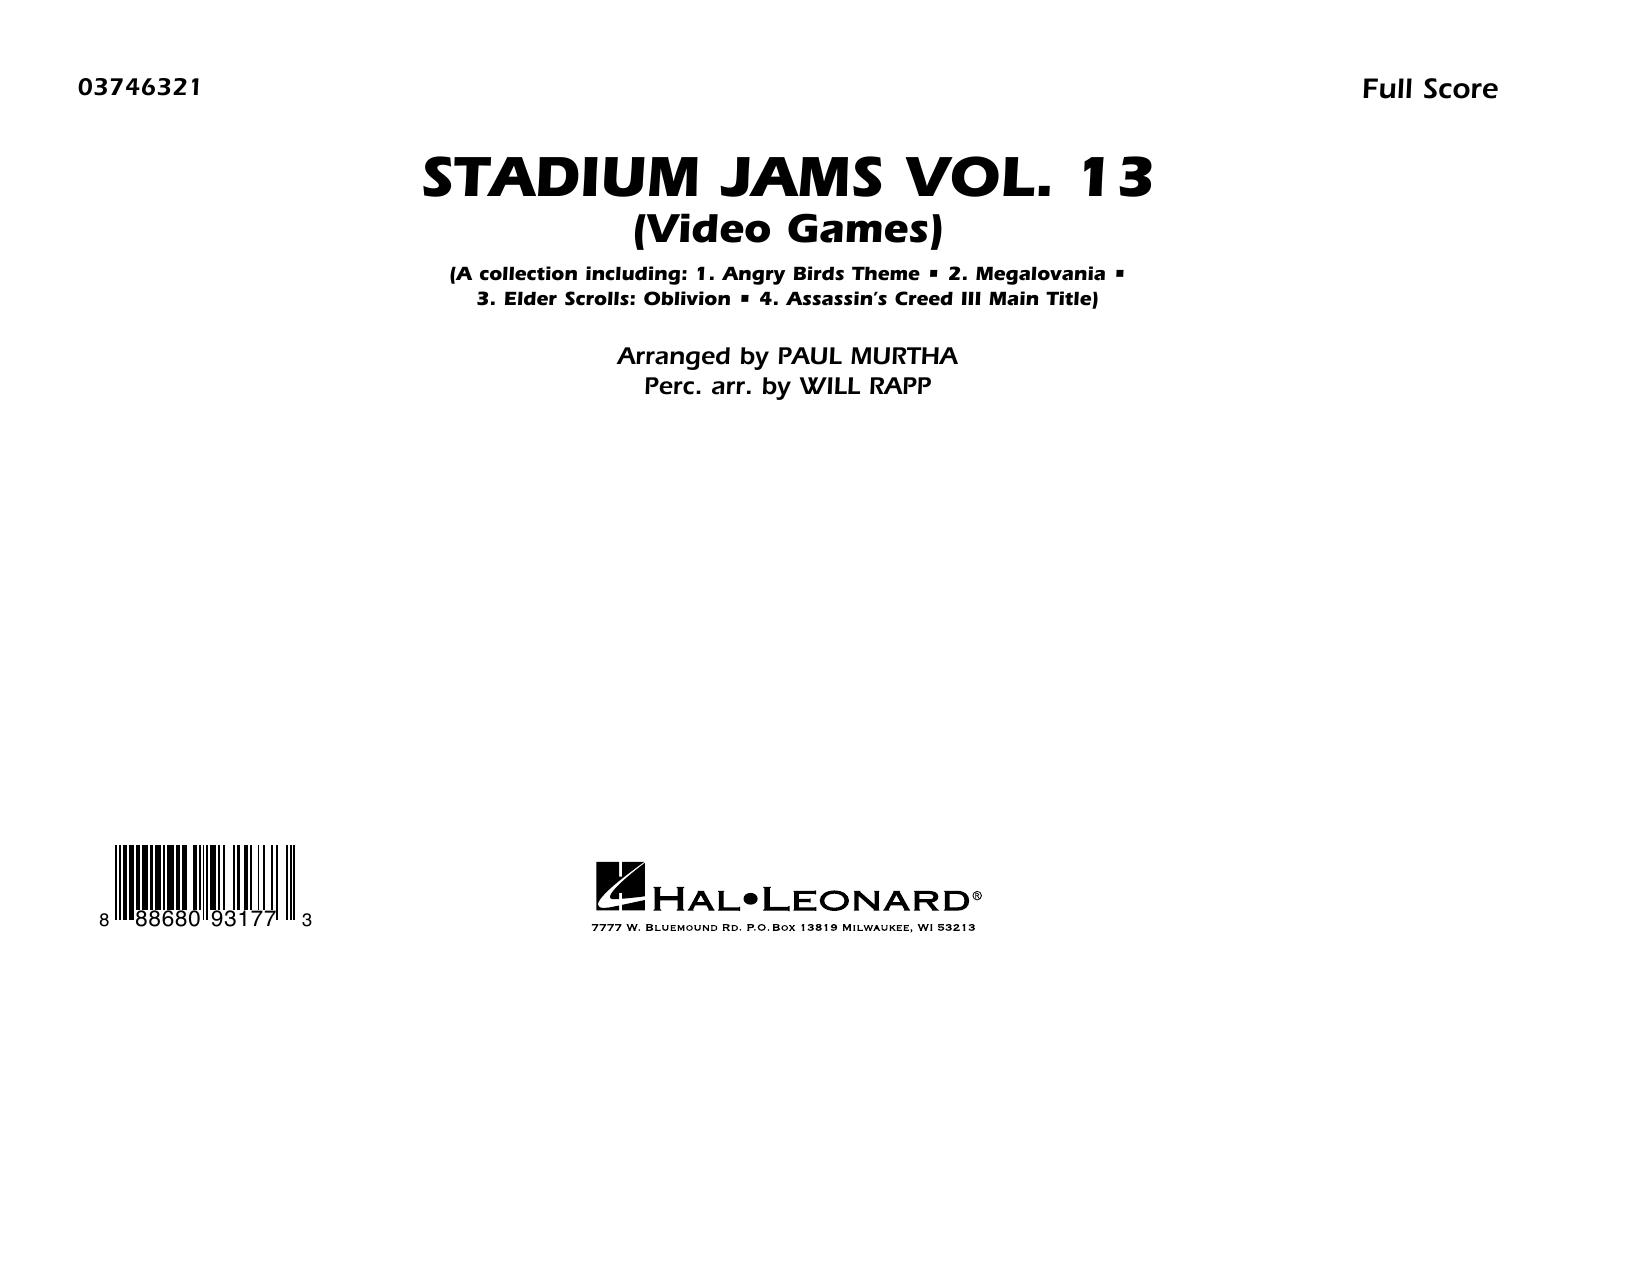 Stadium Jams Volume 13 (Video Games) - Conductor Score (Full Score) (Marching Band)